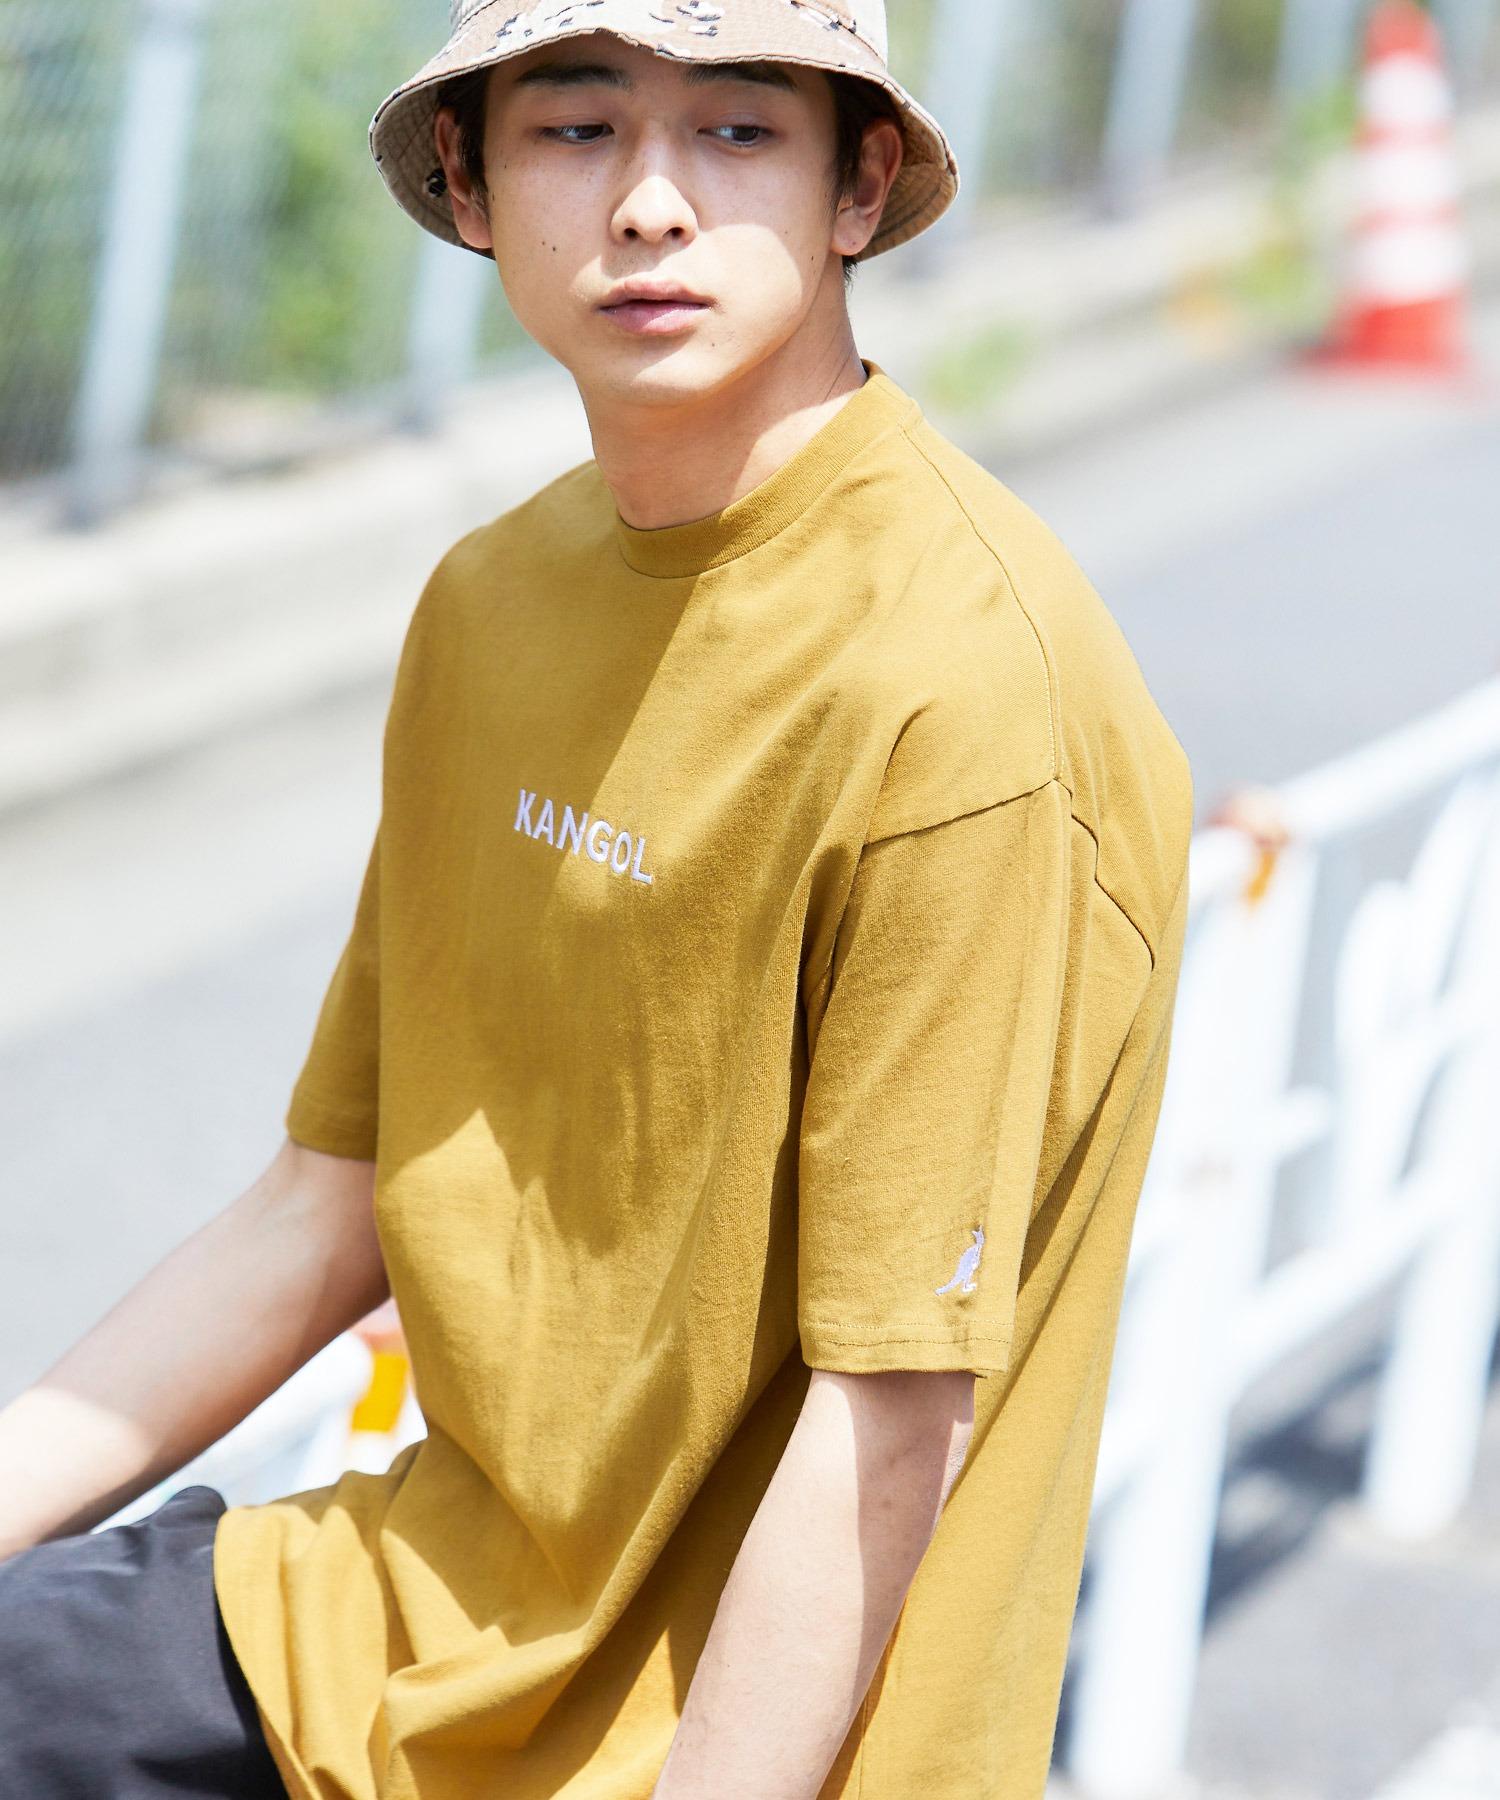 ▽WEB限定 MONO-MART×KANGOL 別注ロゴ刺繍 プリント半袖Tee オーバーサイズカットソー